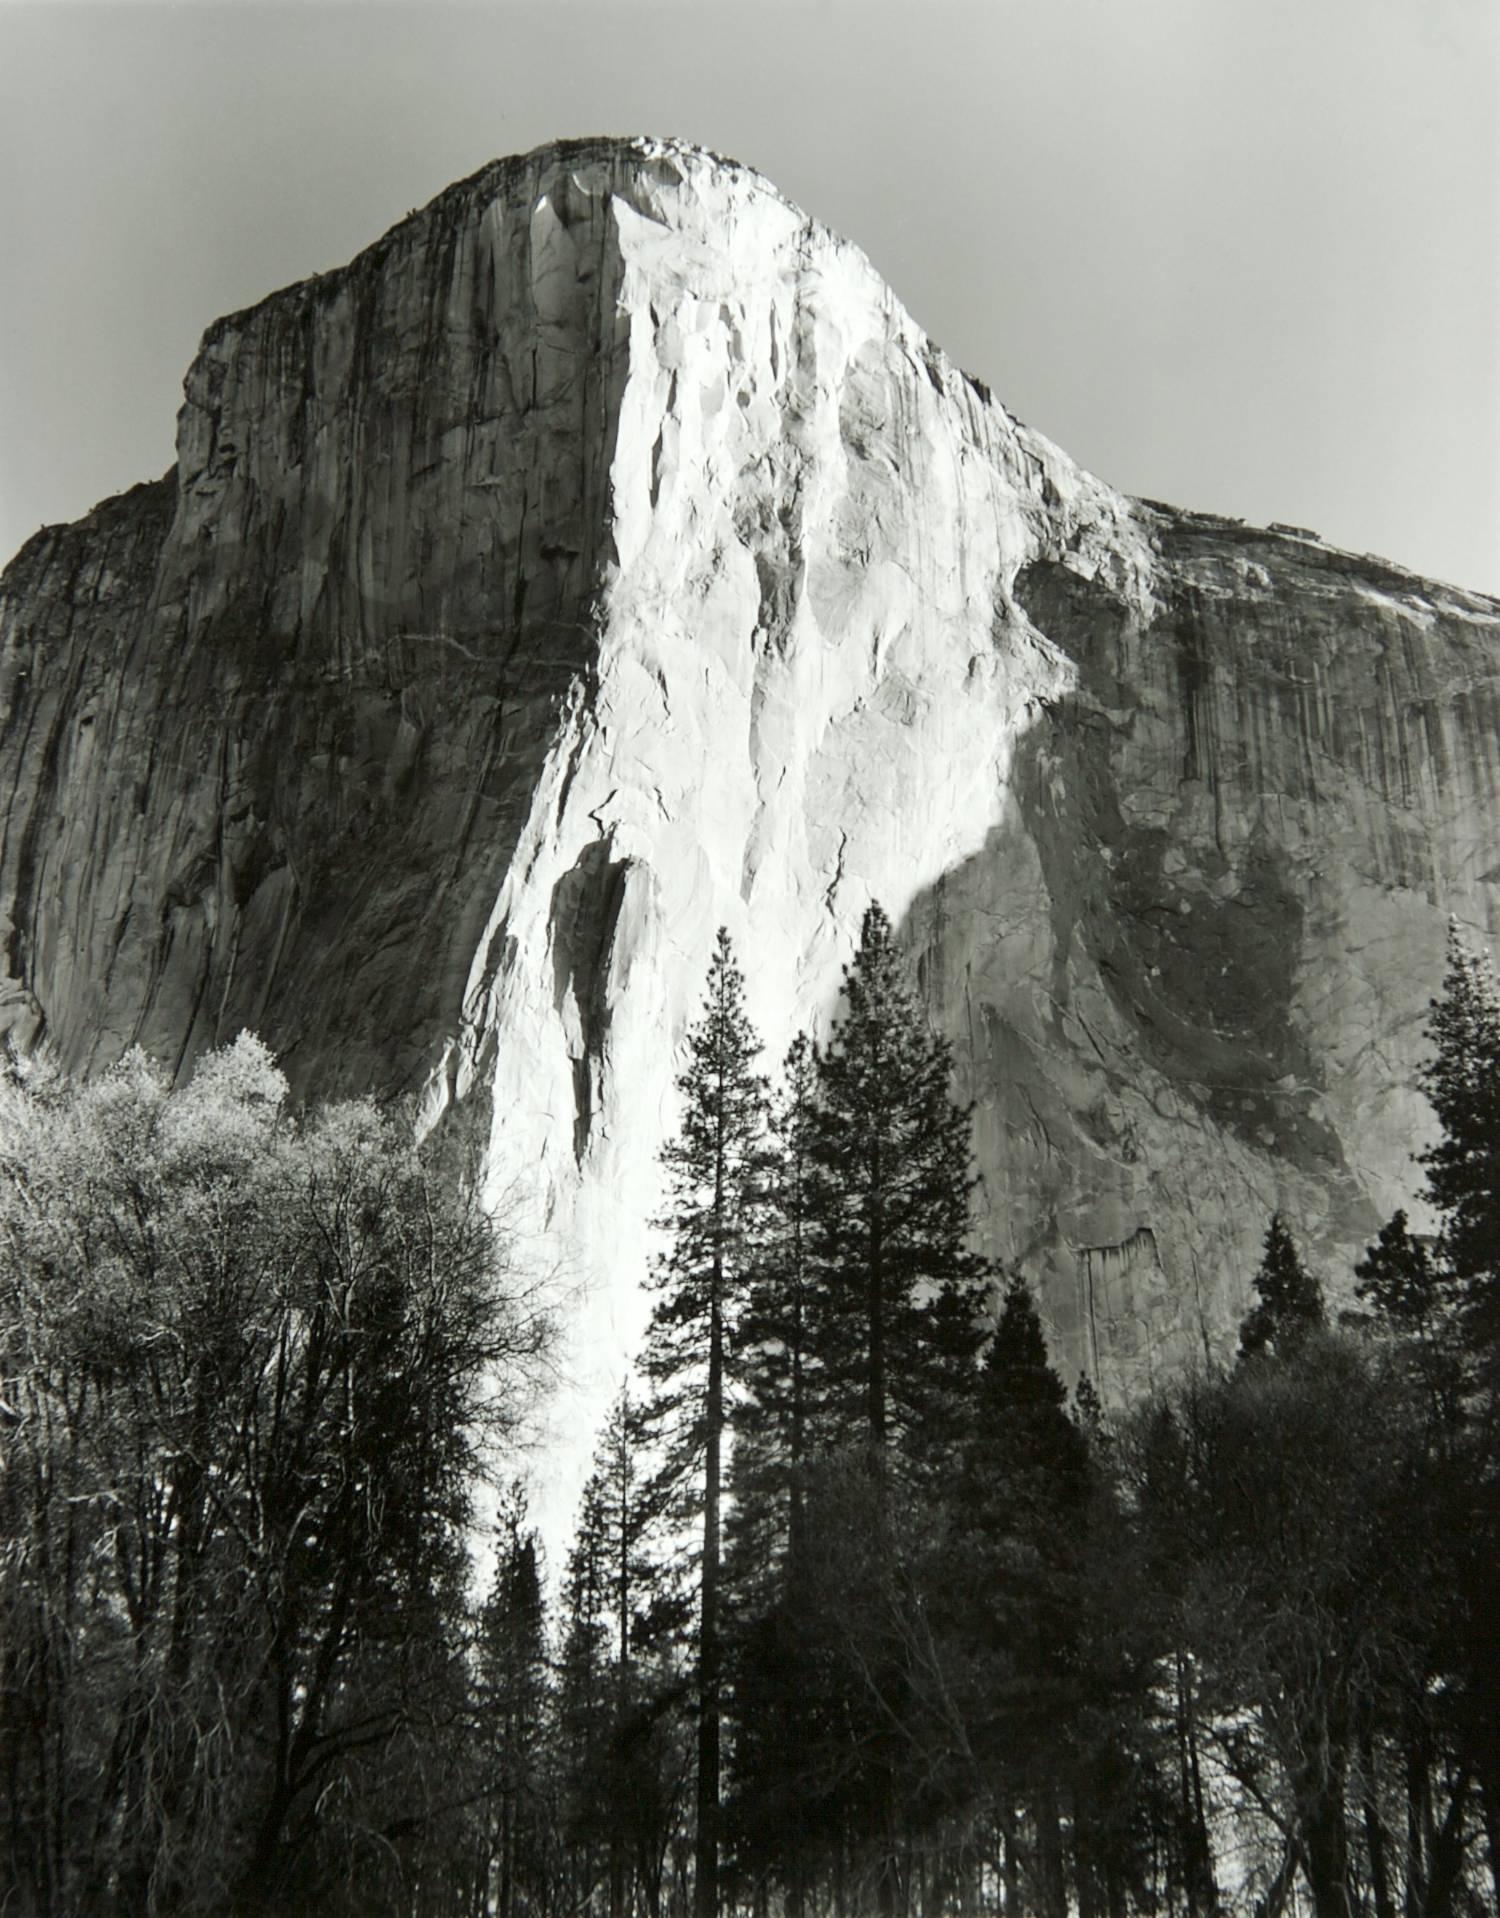 Morning on El Capitan (Yosemite National Park)